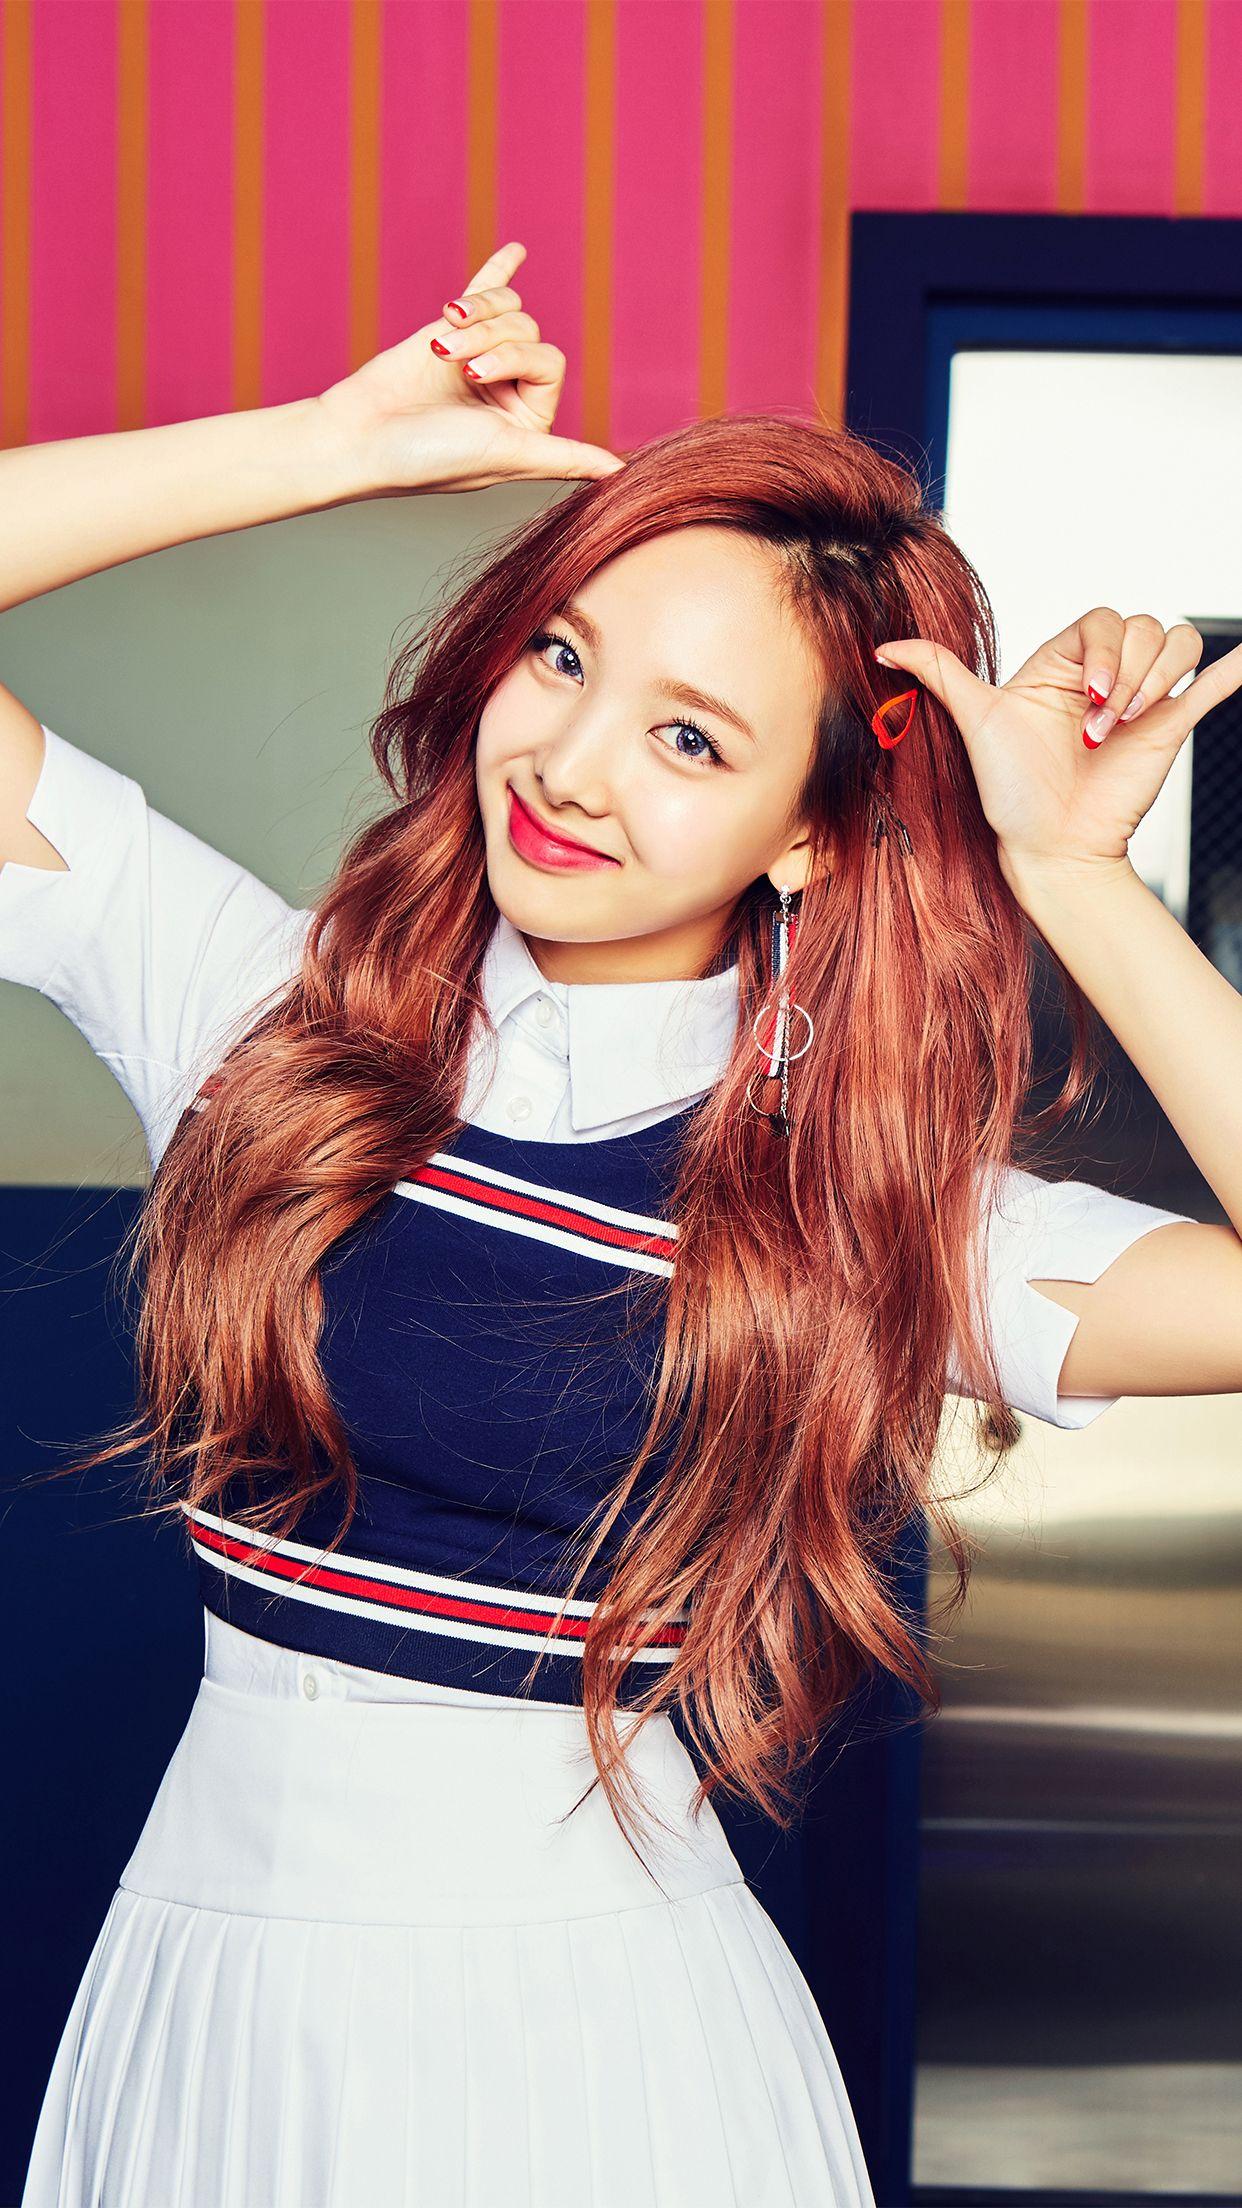 Iphone Wallpaper Twice 트와이스 Imnayeon 임나연 Nayeon 나연 Kpop